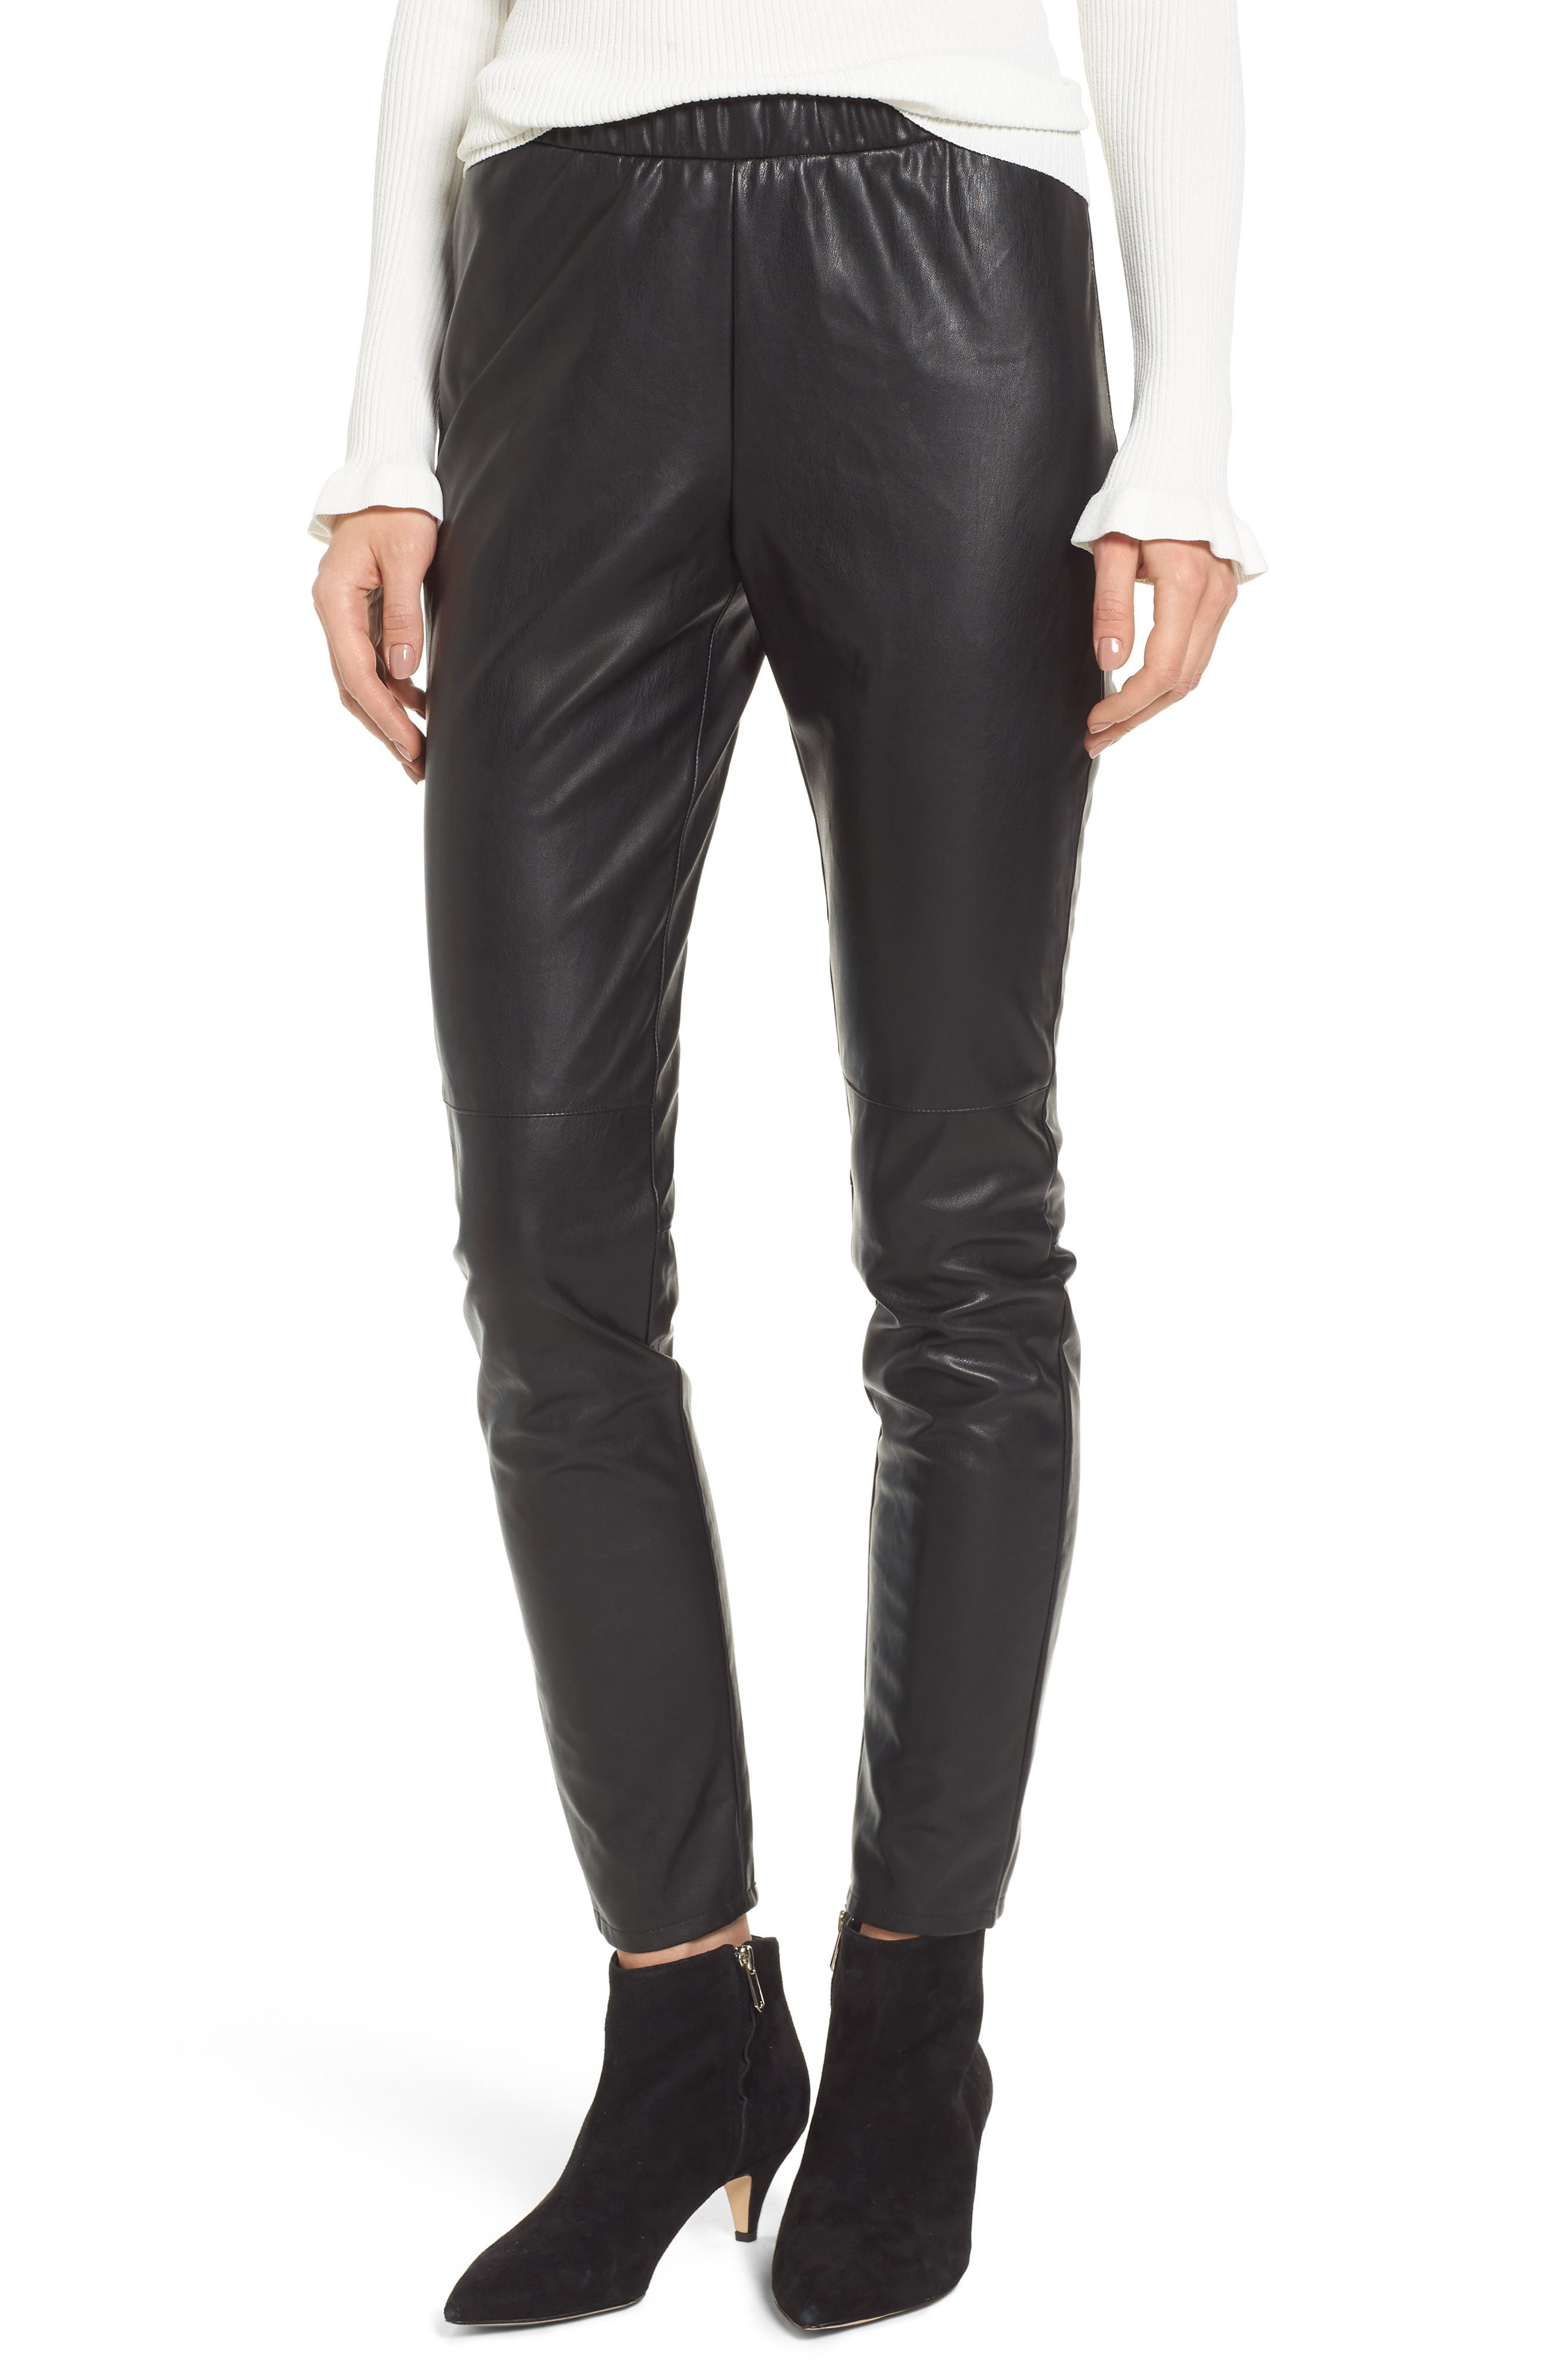 Zowie Faux Leather Pants,                             Main thumbnail 1, color,                             001